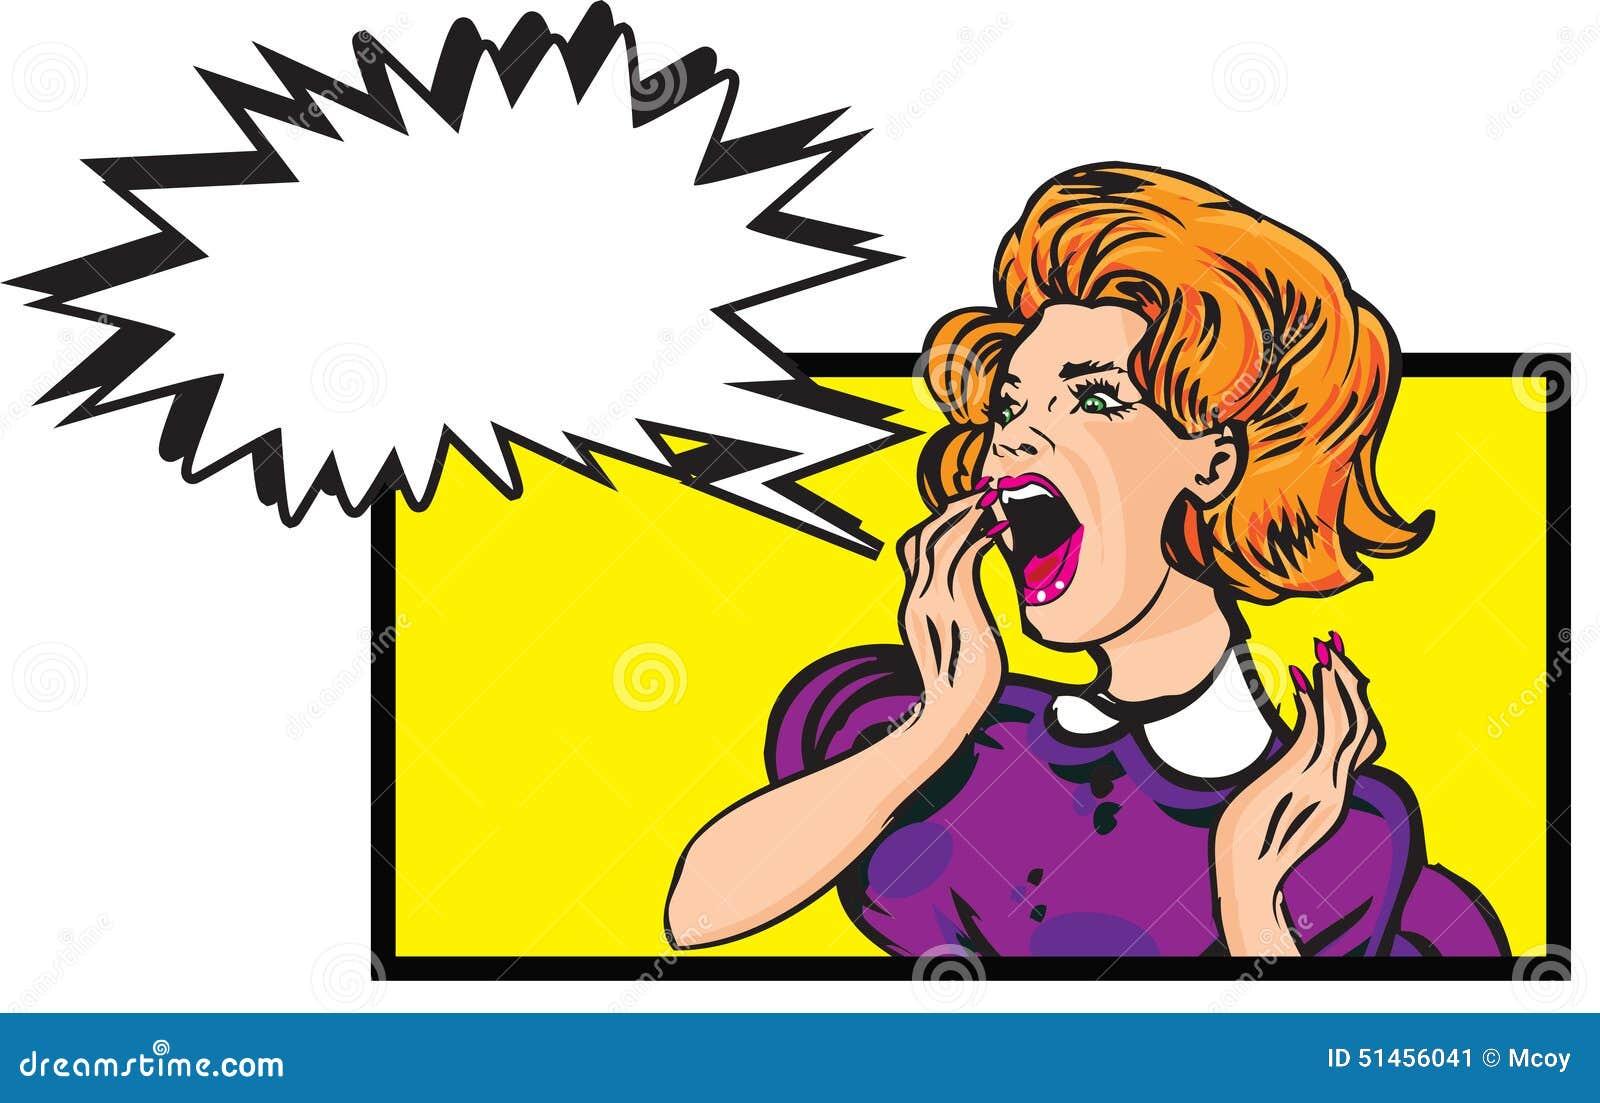 scared woman retro clip art illustration with speech bubble stock rh dreamstime com clip art of women dressed to kill clip art of women dancing